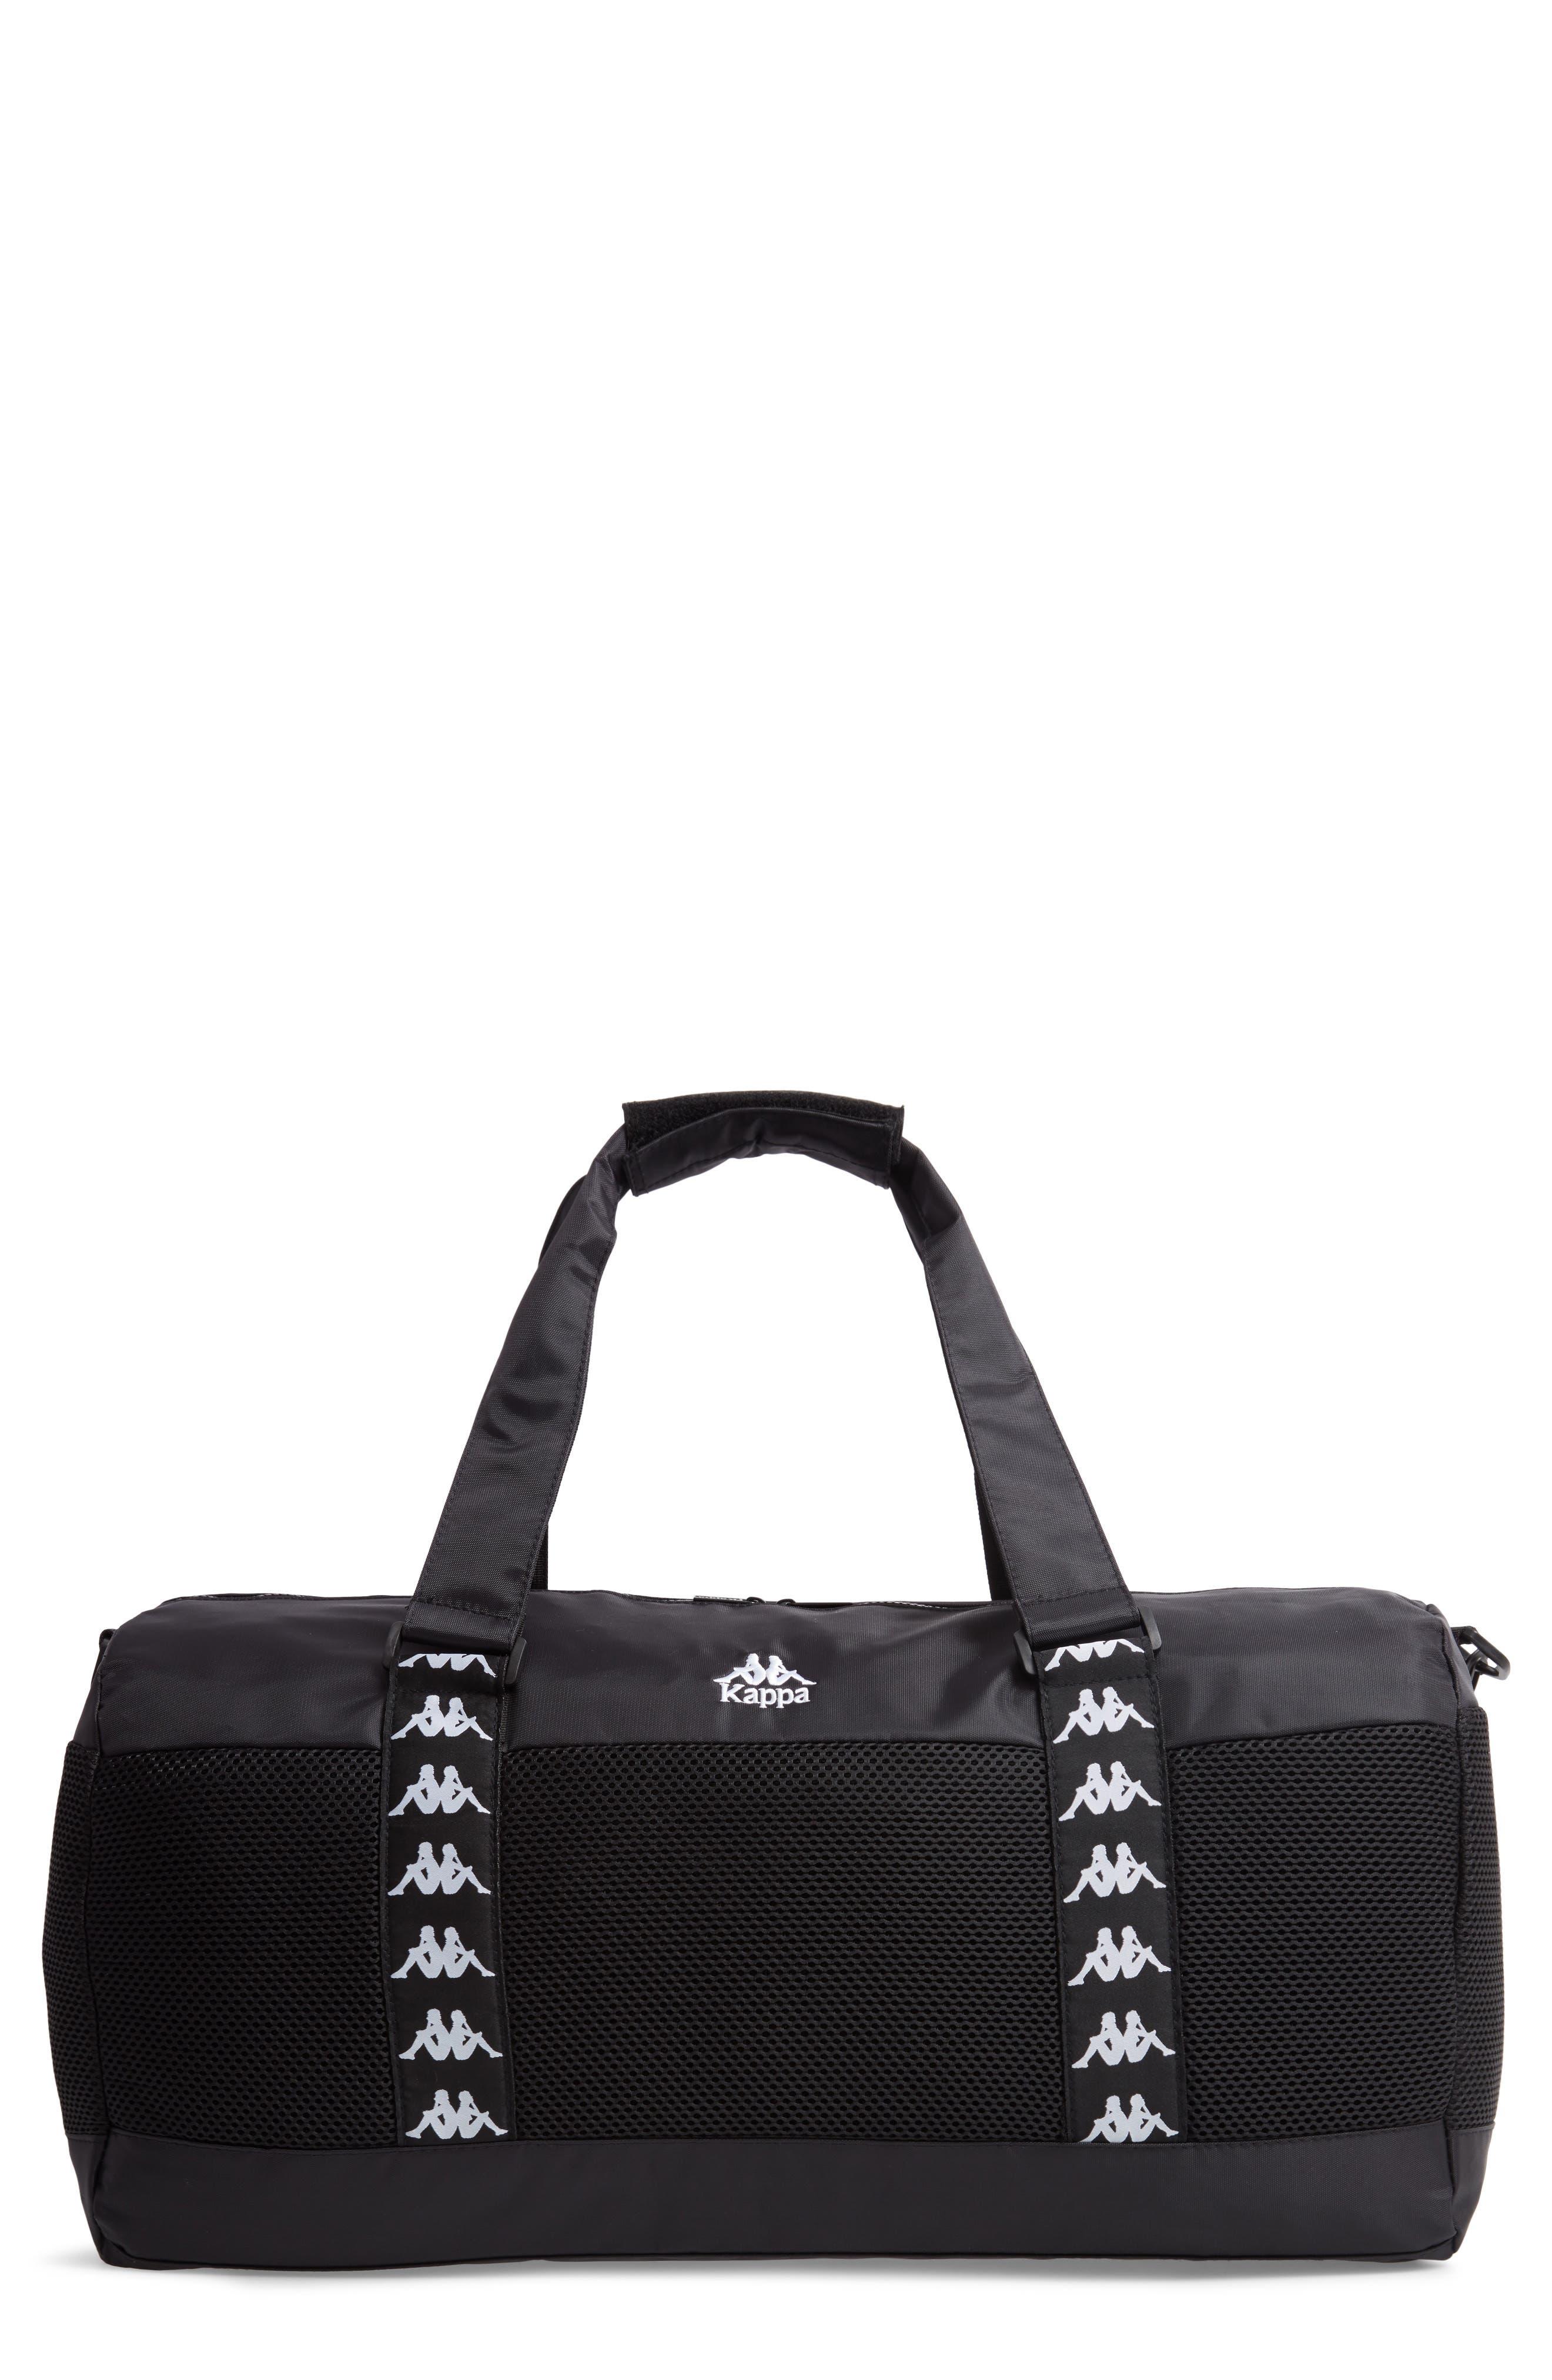 XL Athletic Duffel Bag,                         Main,                         color, BLACK-WHITE